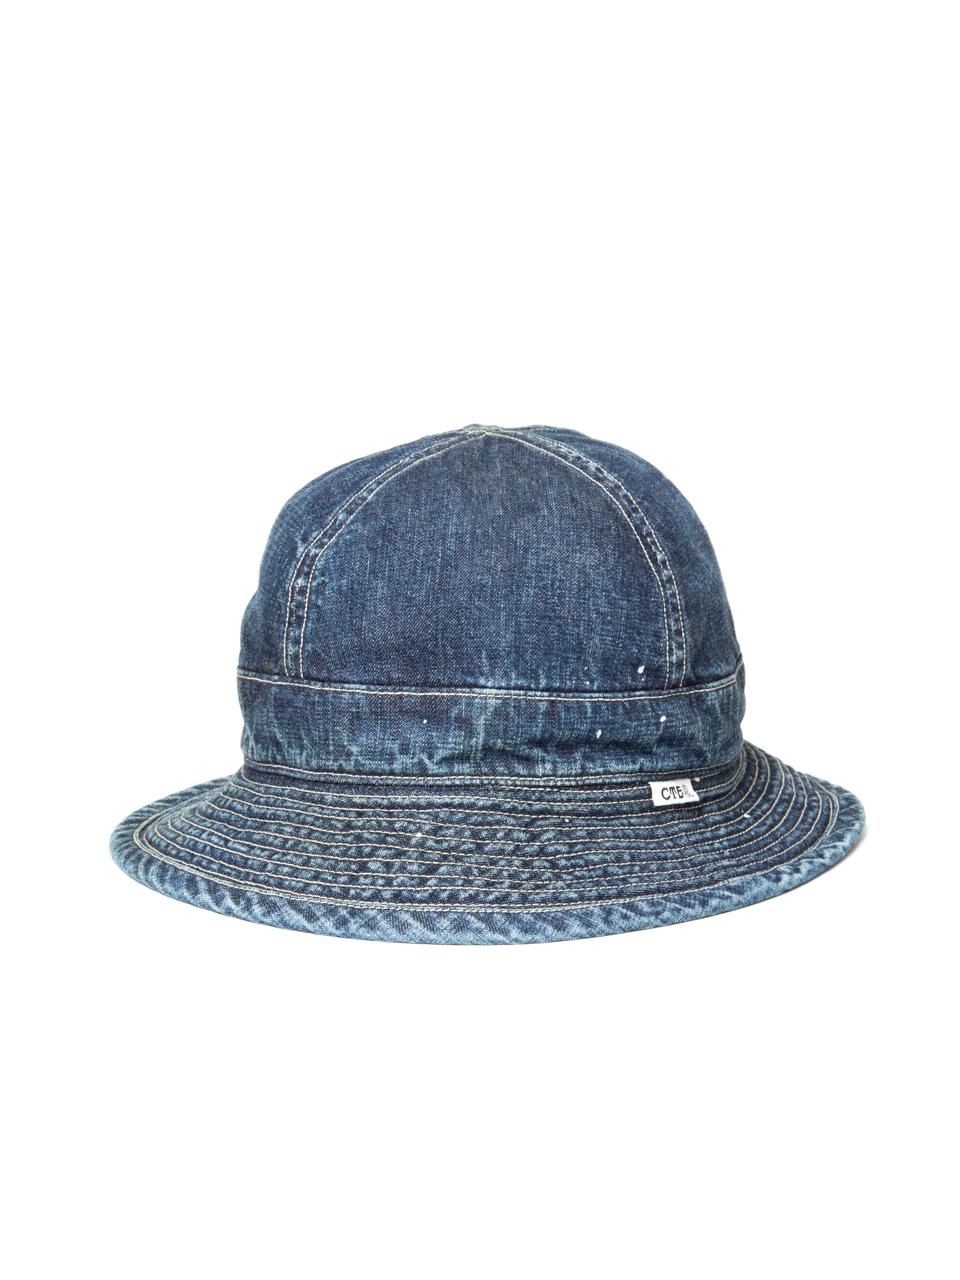 Junkman Hat-Indigo-